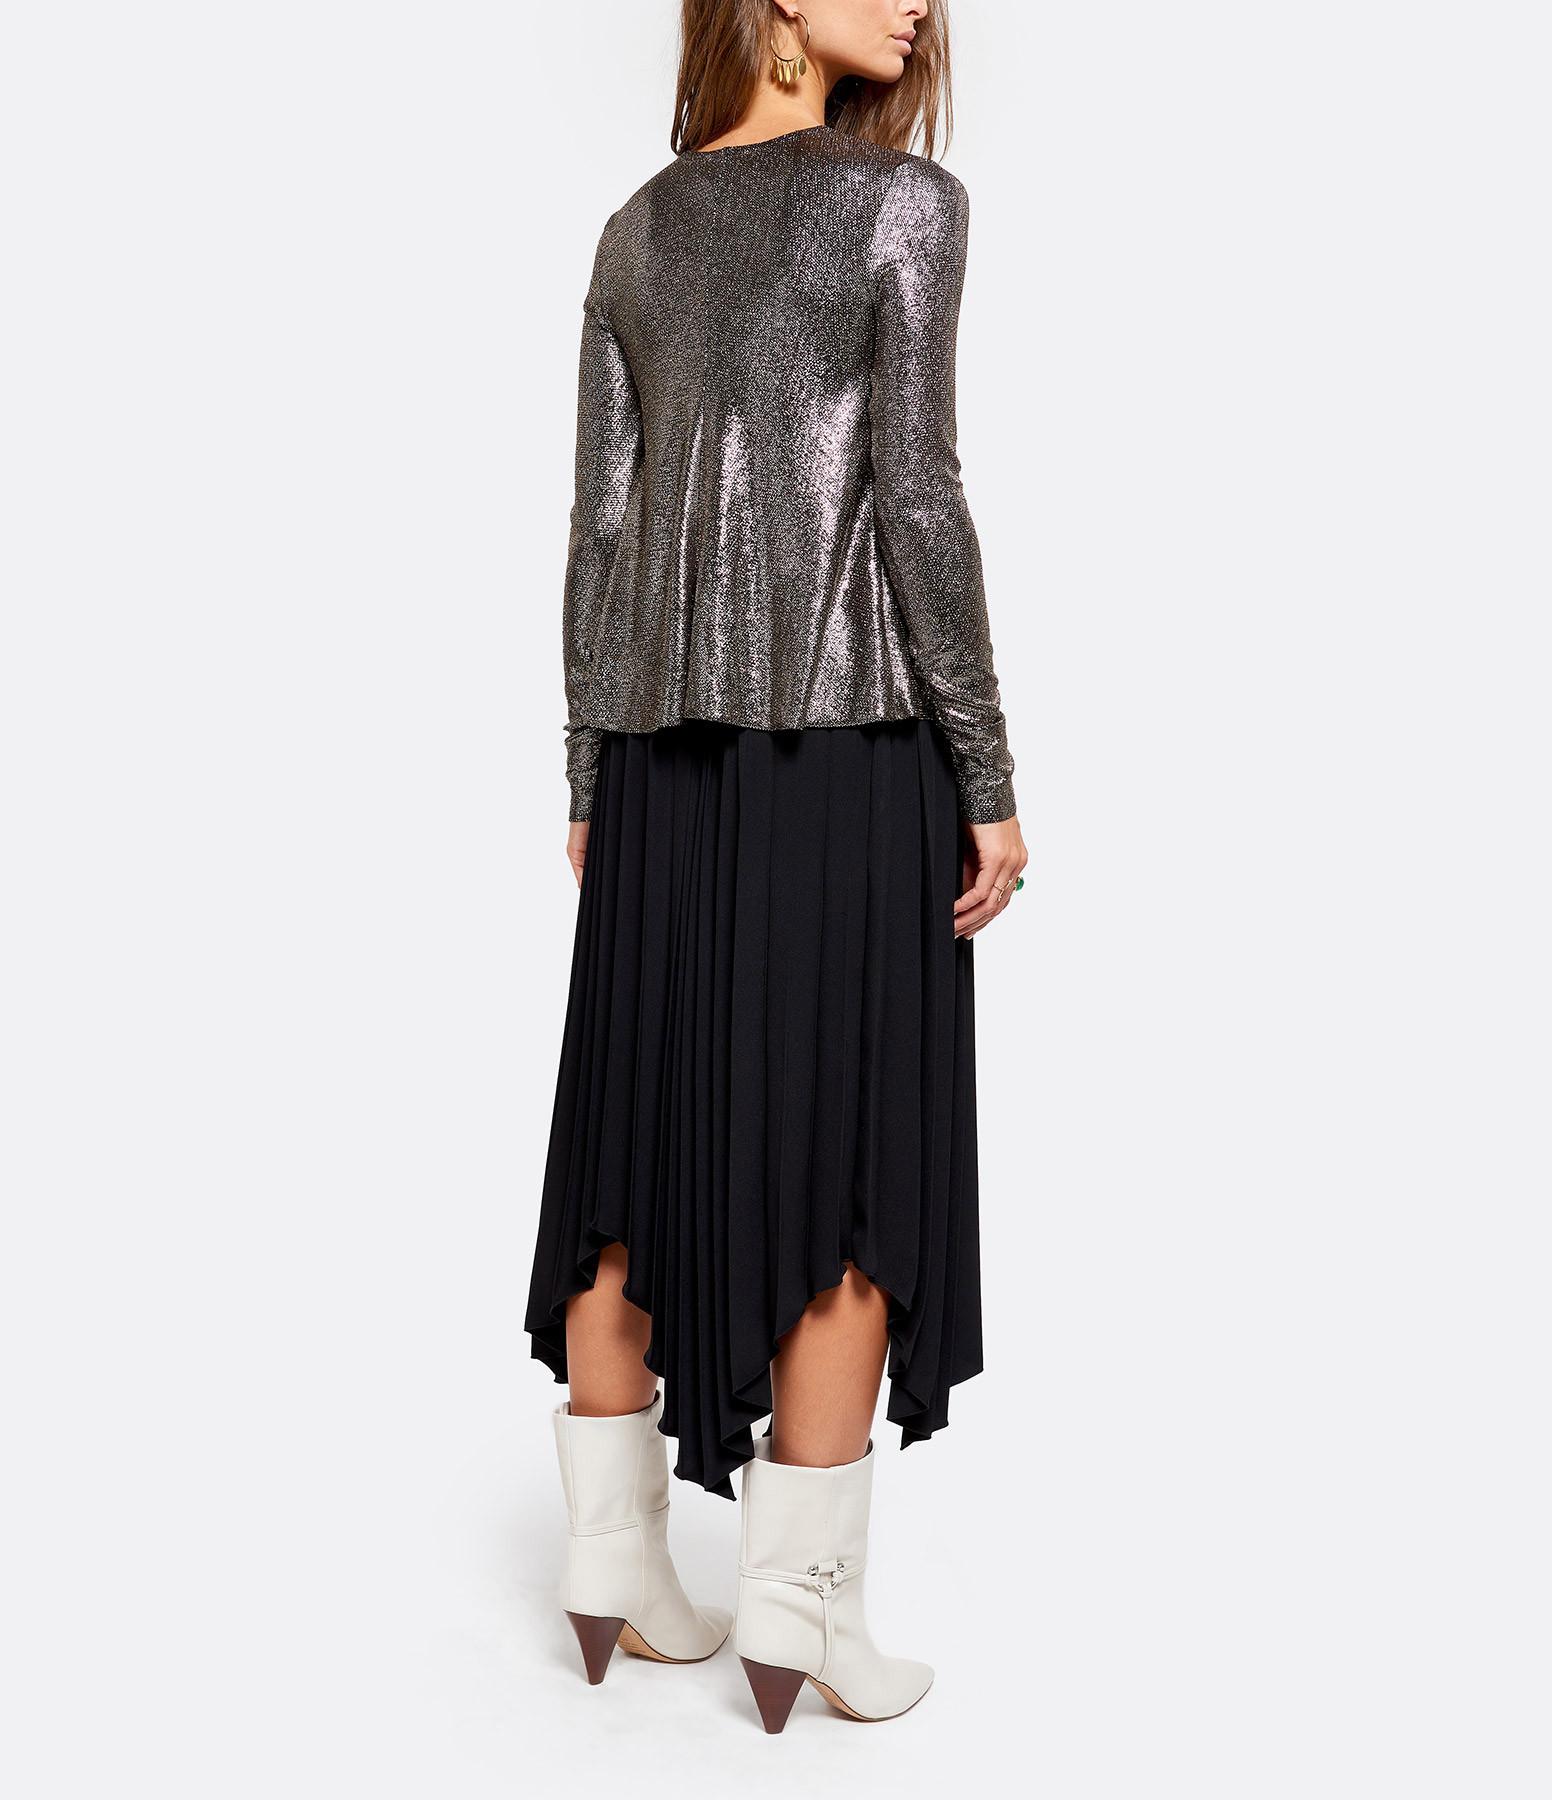 FORTE_FORTE - Tee-shirt Laminated Jersey Noir